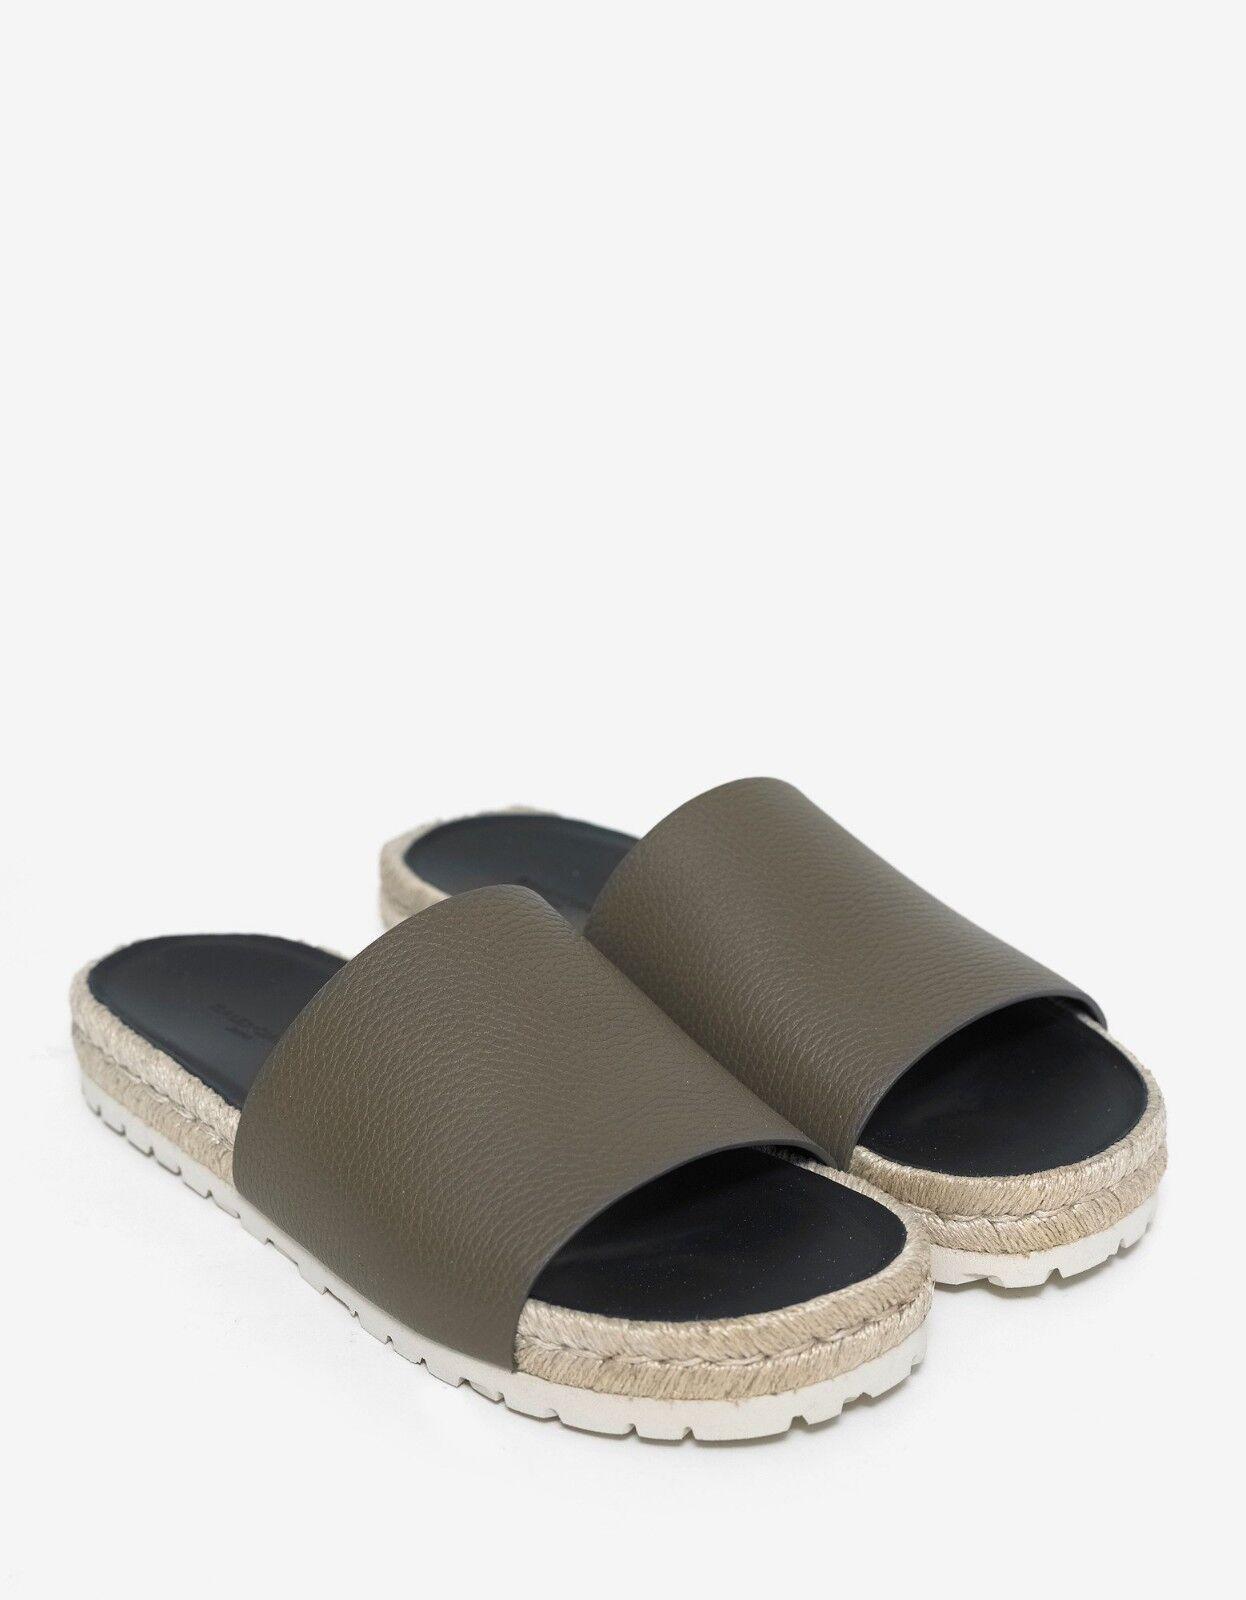 New BALENCIAGA Khaki Leather Espadrille Sandals Size 40 BNIB